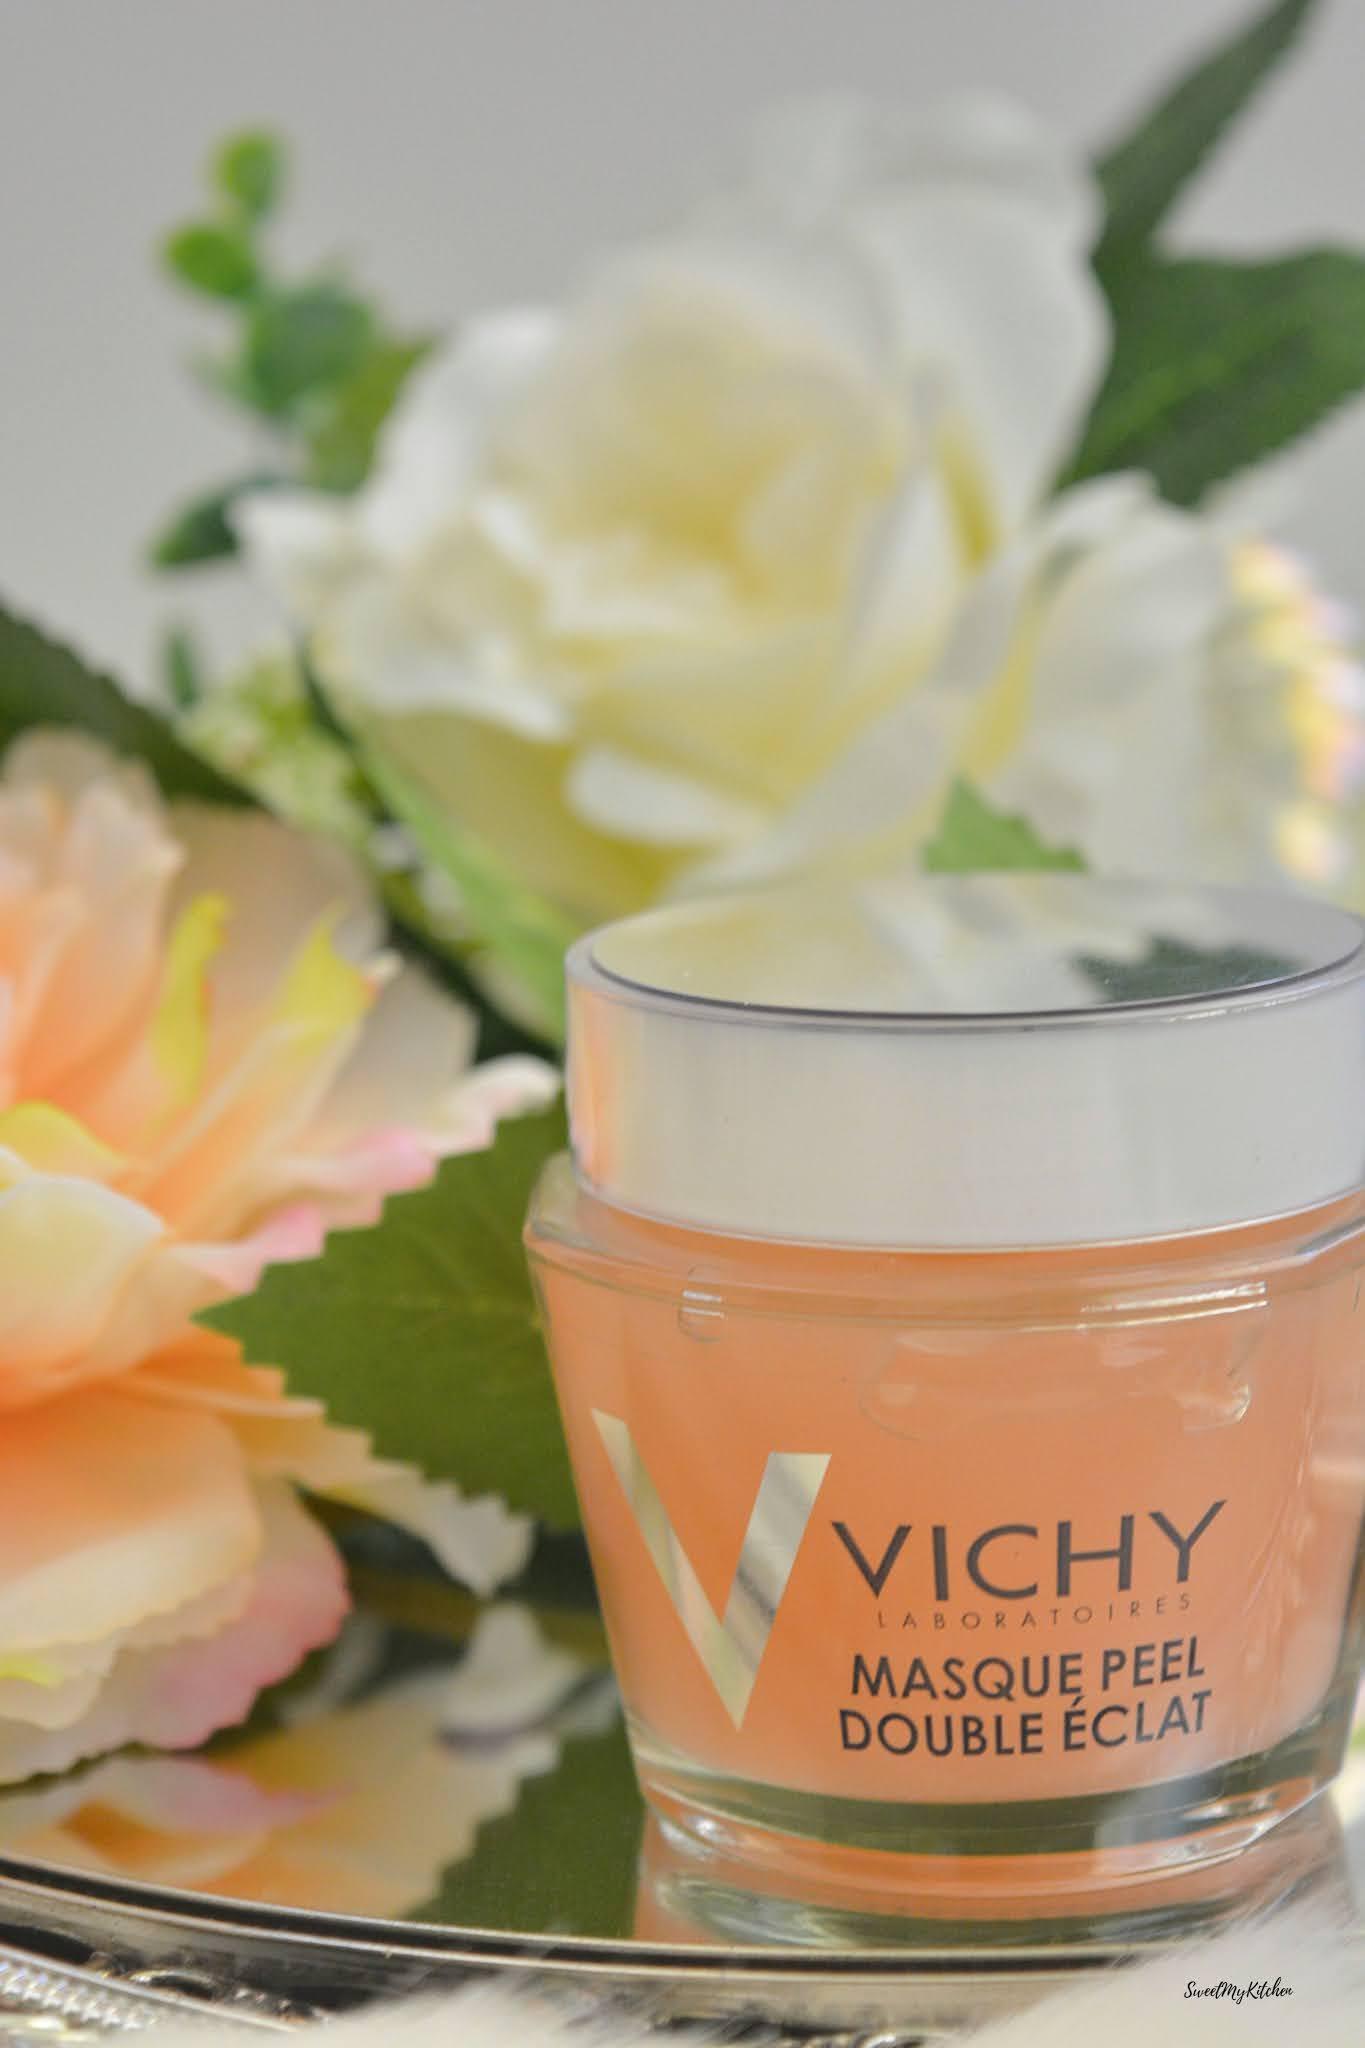 Vichy Masque Peel Double Éclat